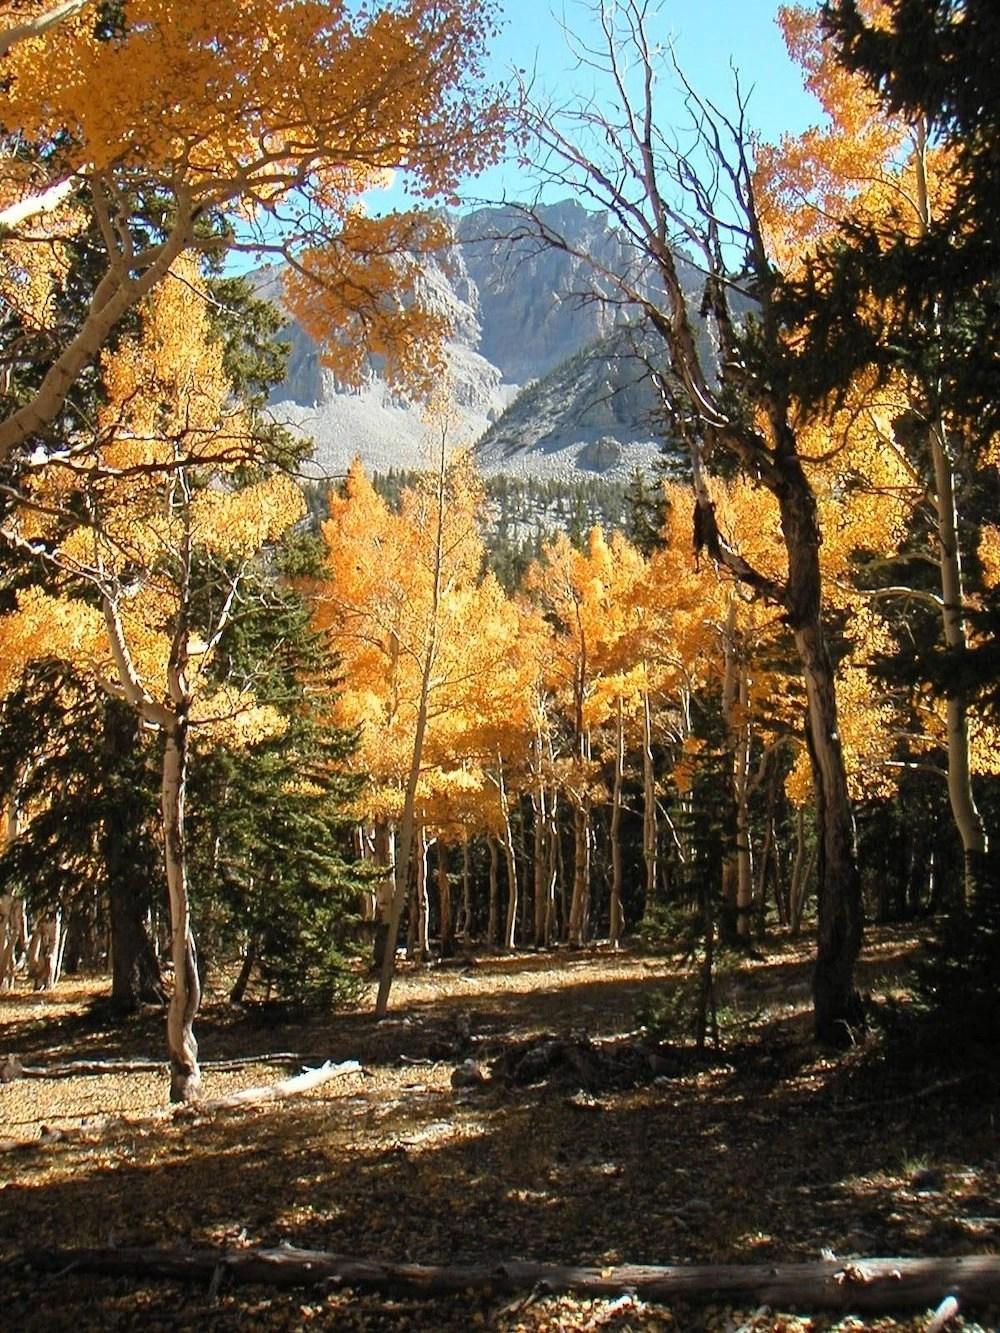 Stargazing in Great Basin - Autumn Colors